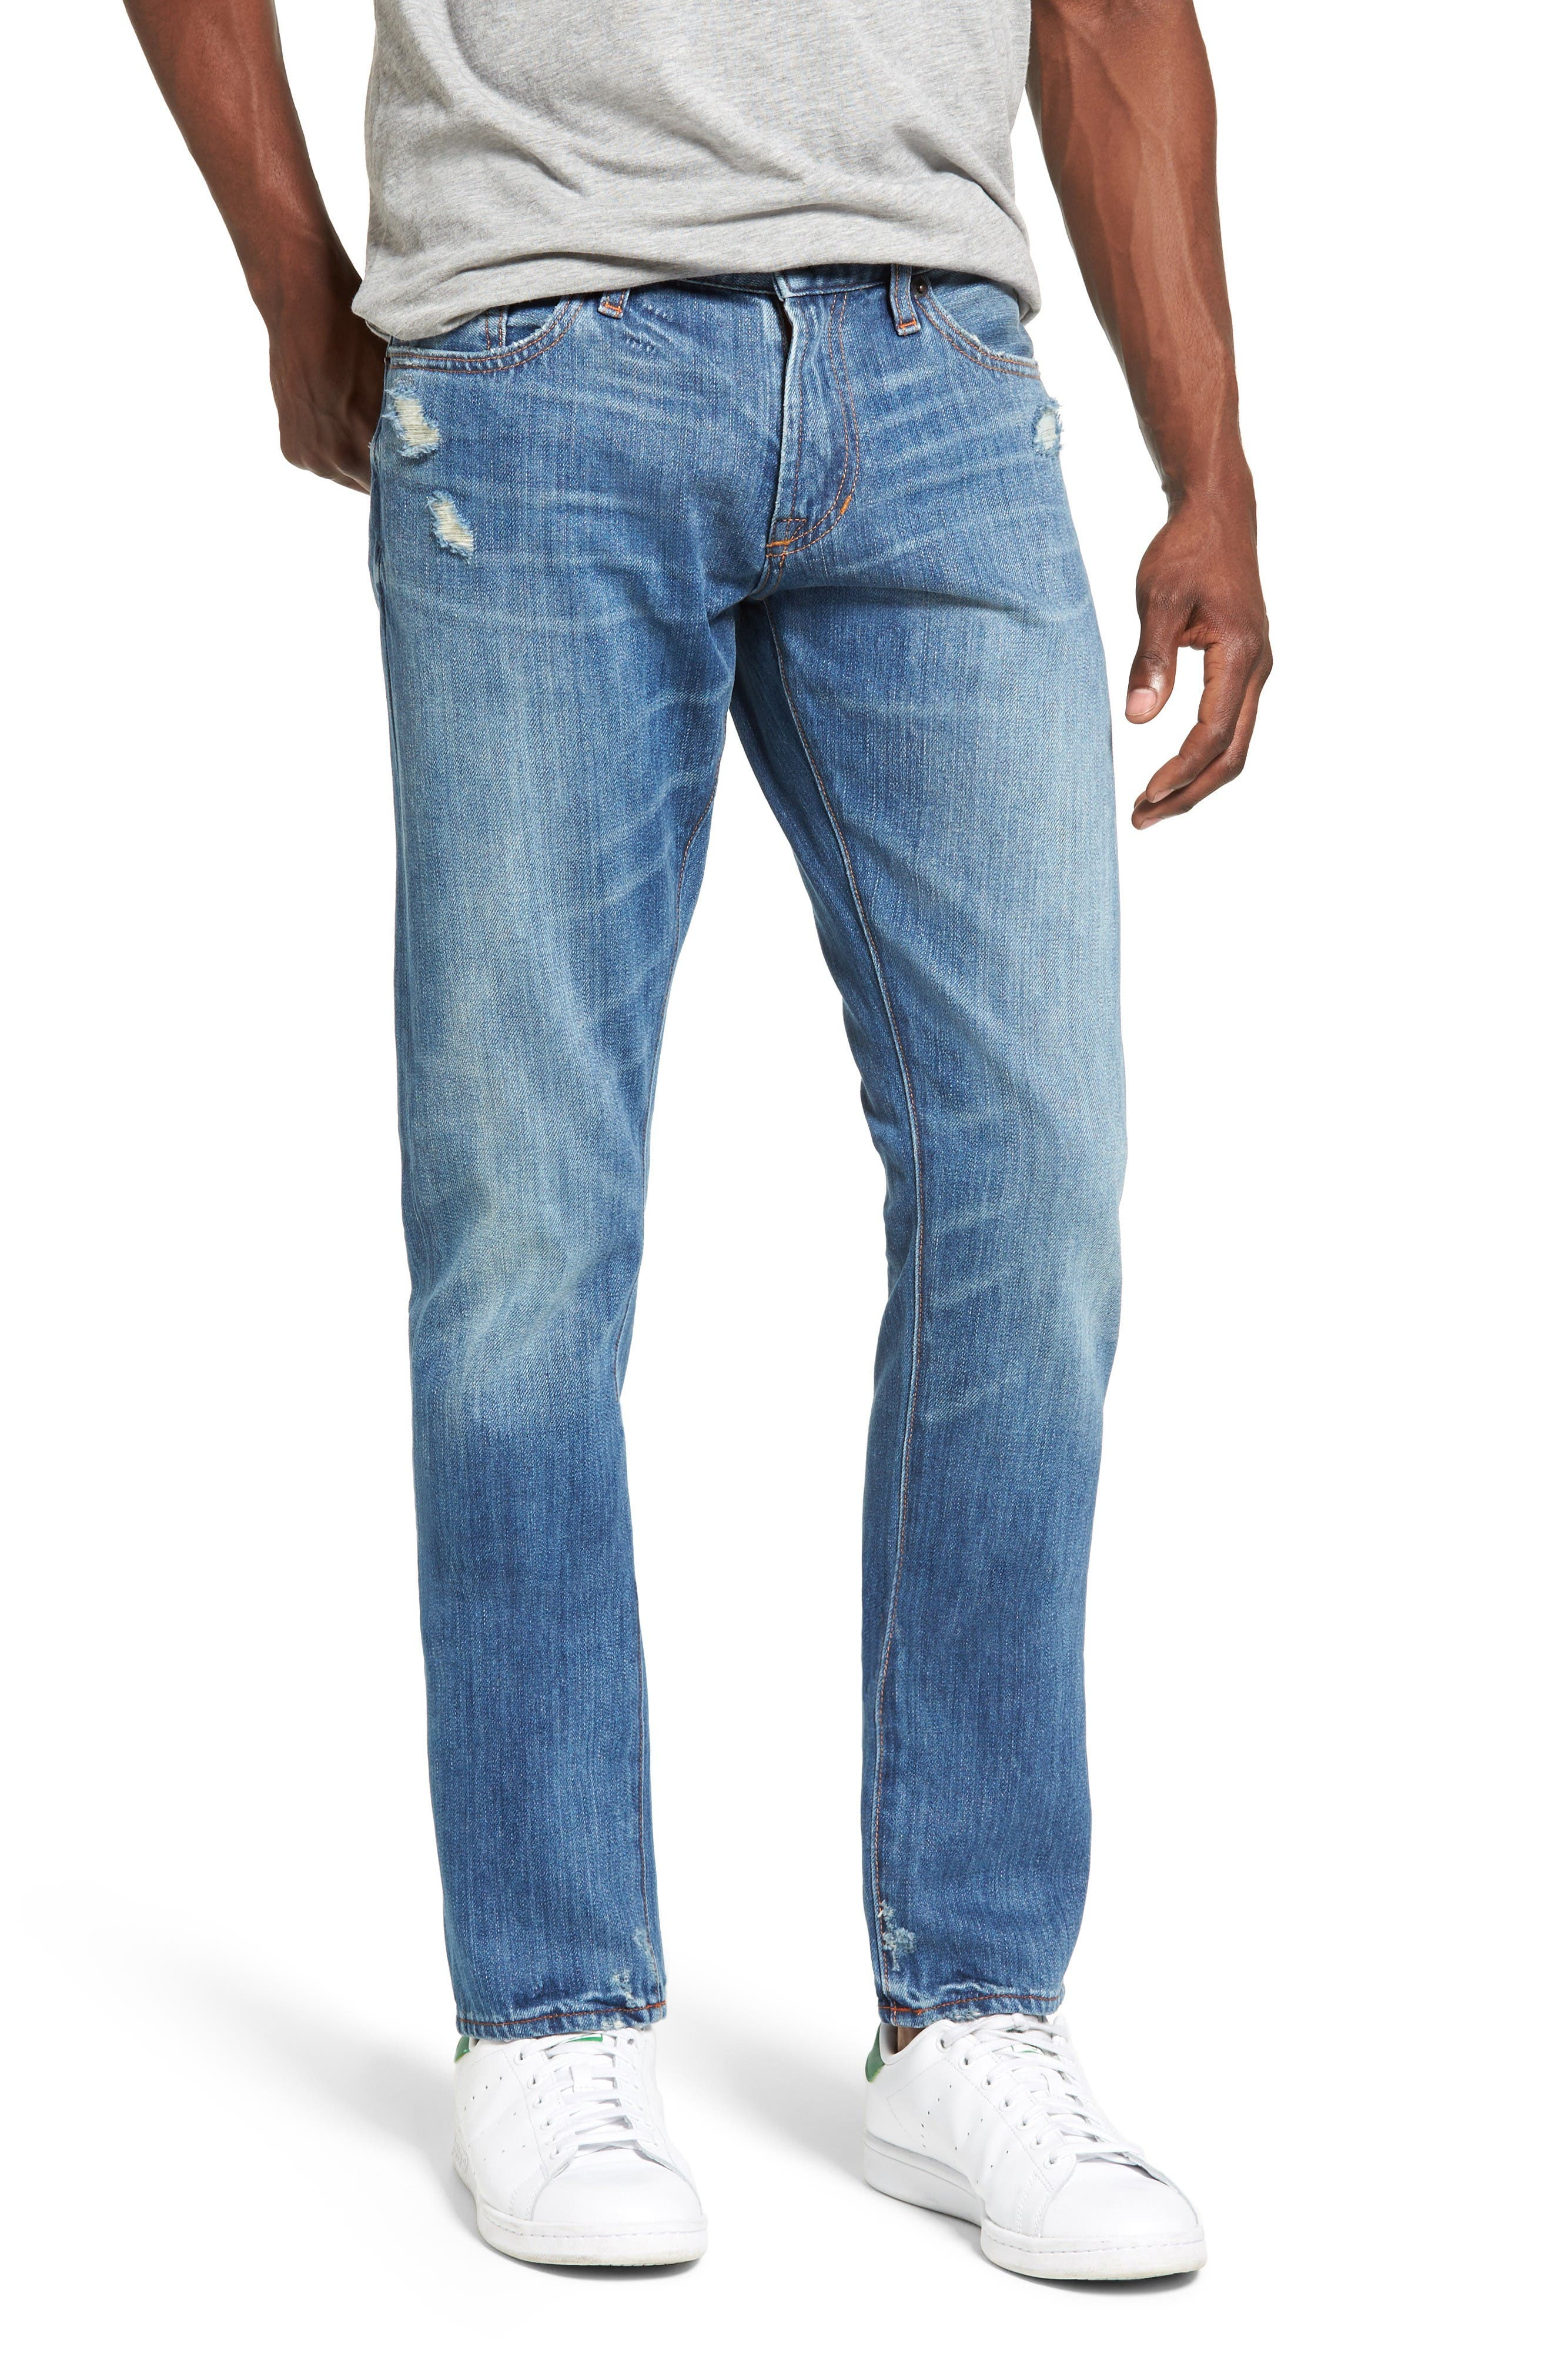 JEAN SHOP Jim Slim Fit Selvedge Jeans